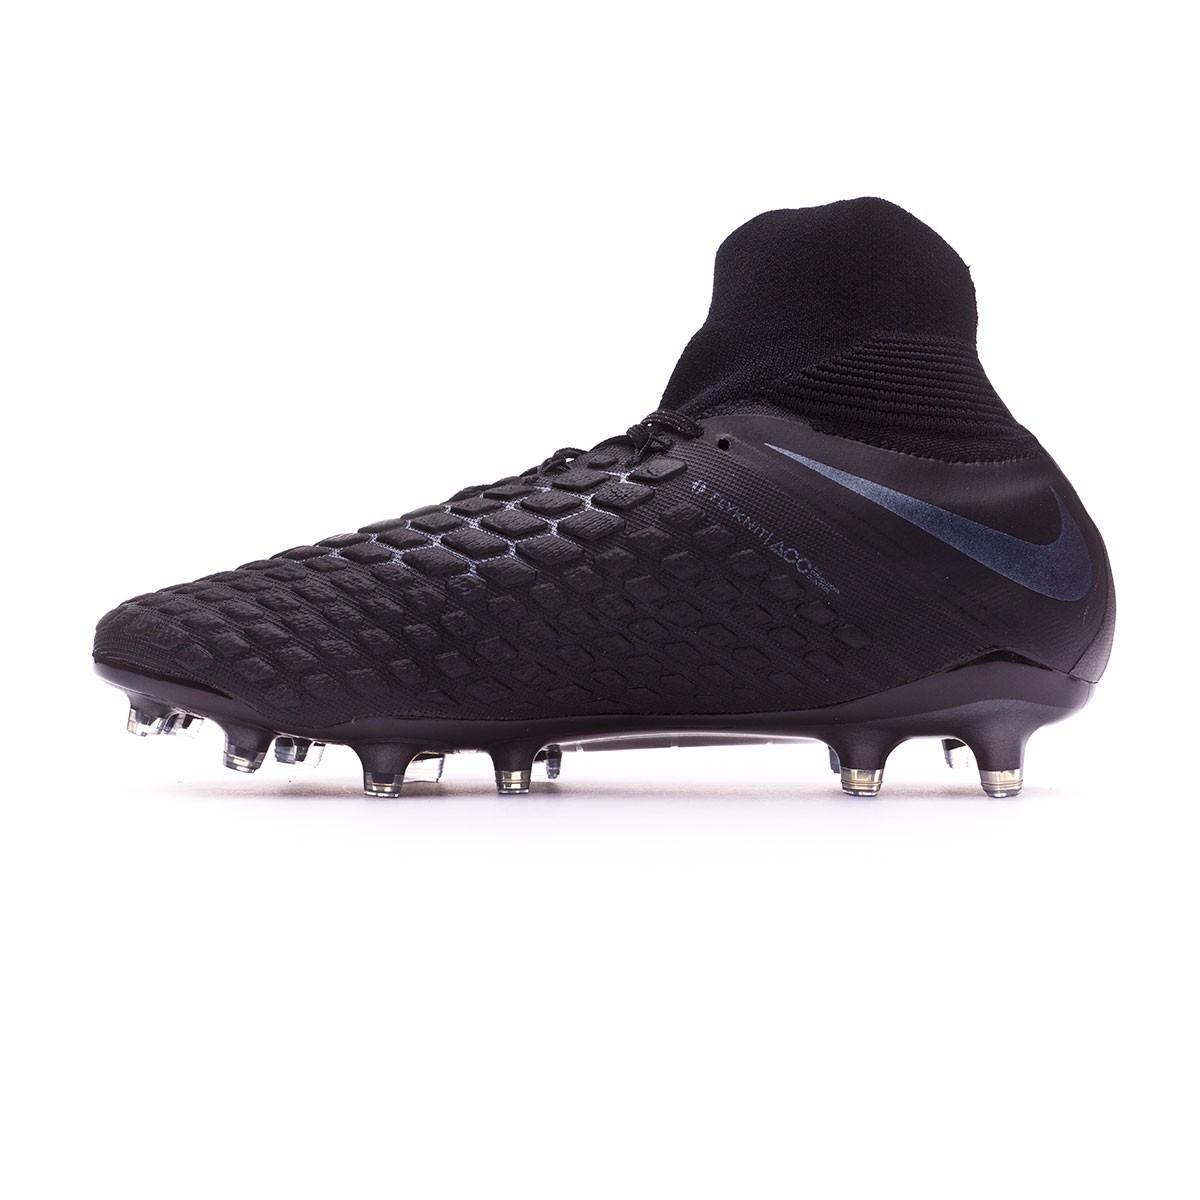 Zapatos de fútbol Nike Hypervenom Phantom III Elite DF FG